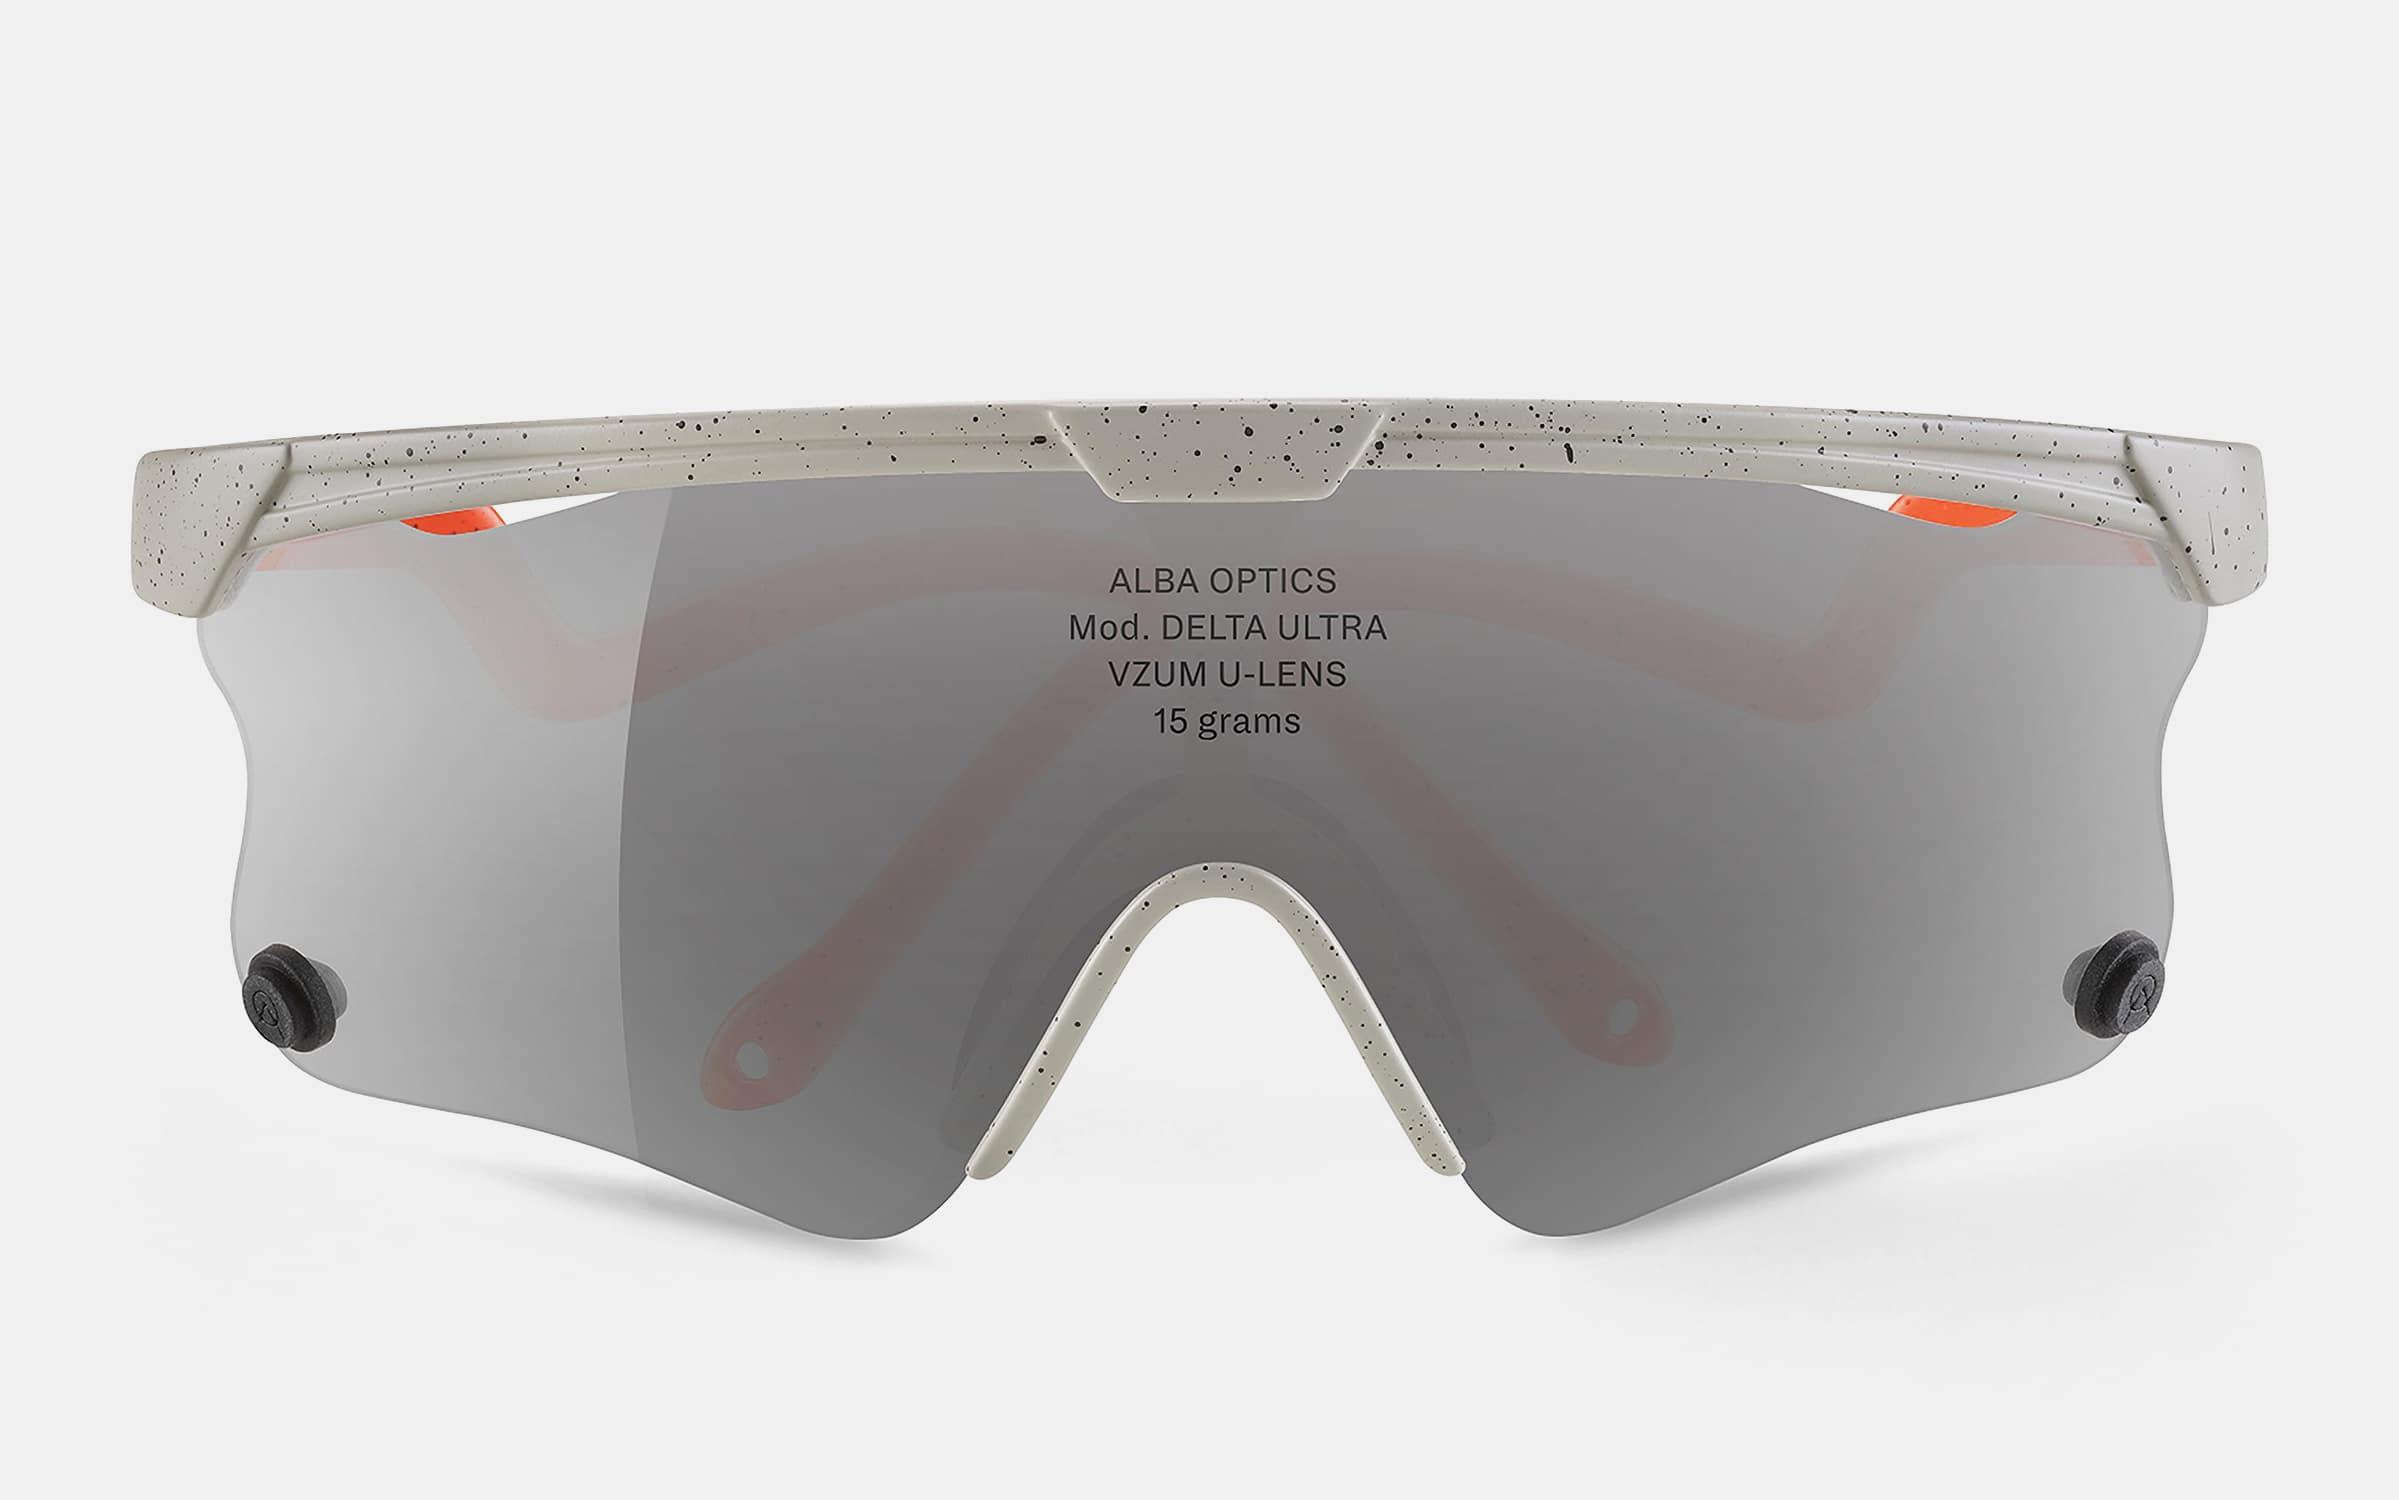 Alba Optics Delta Ultra Sunglasses